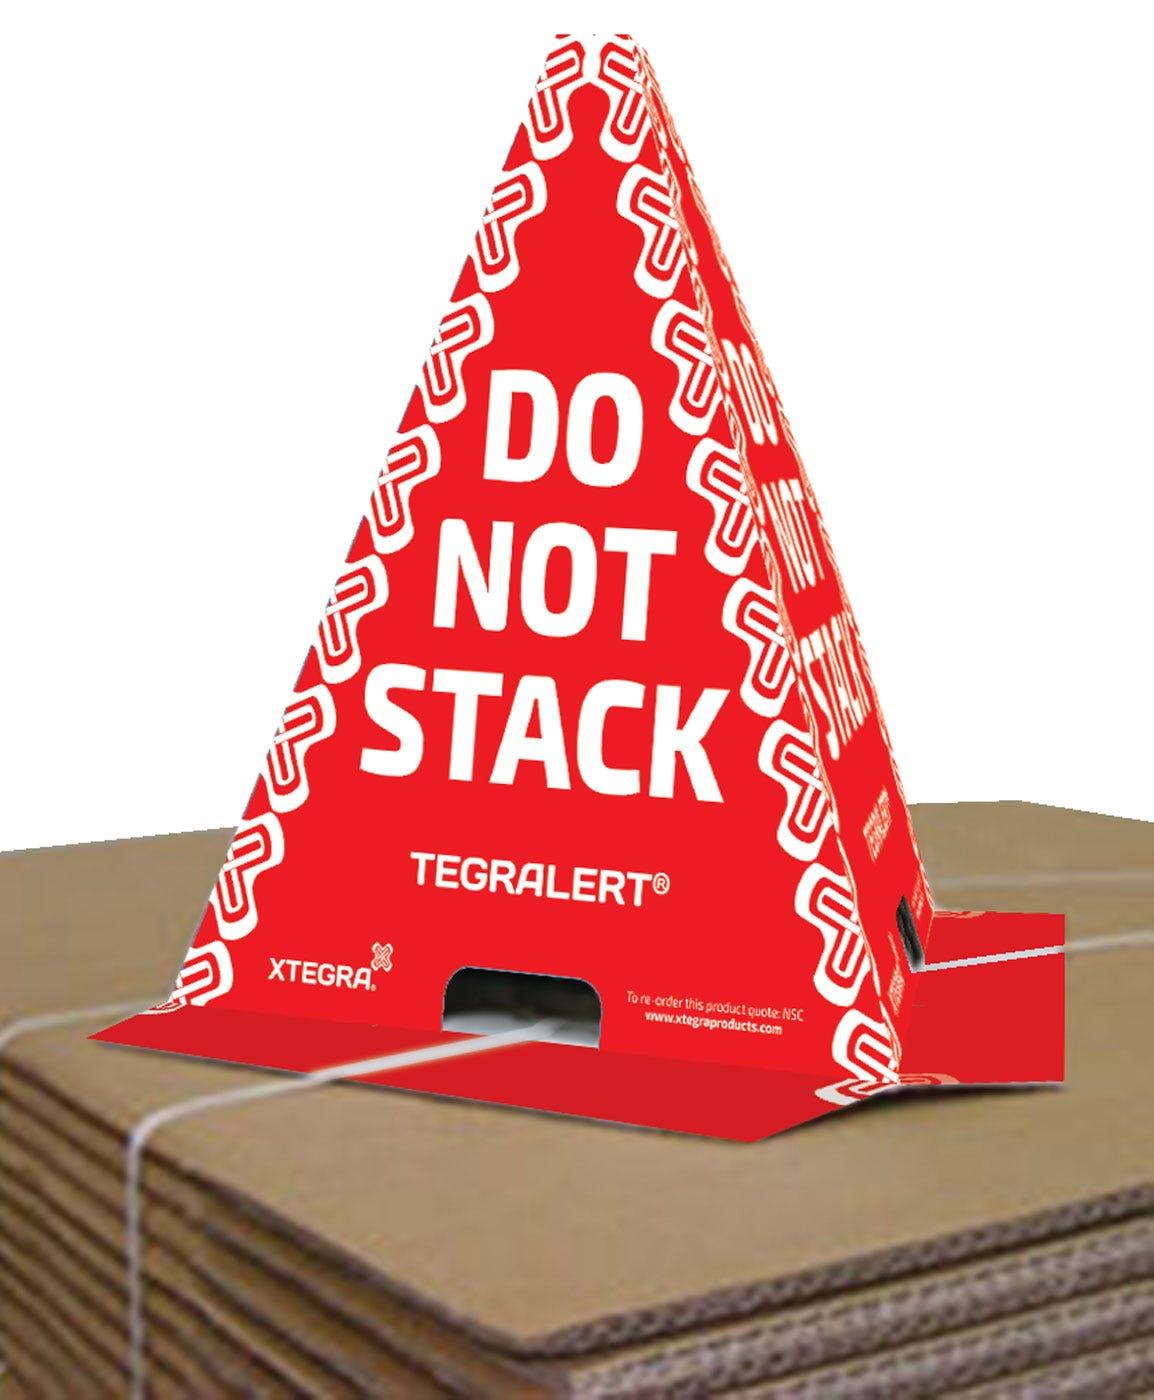 Tegralert® Non Stack Cones